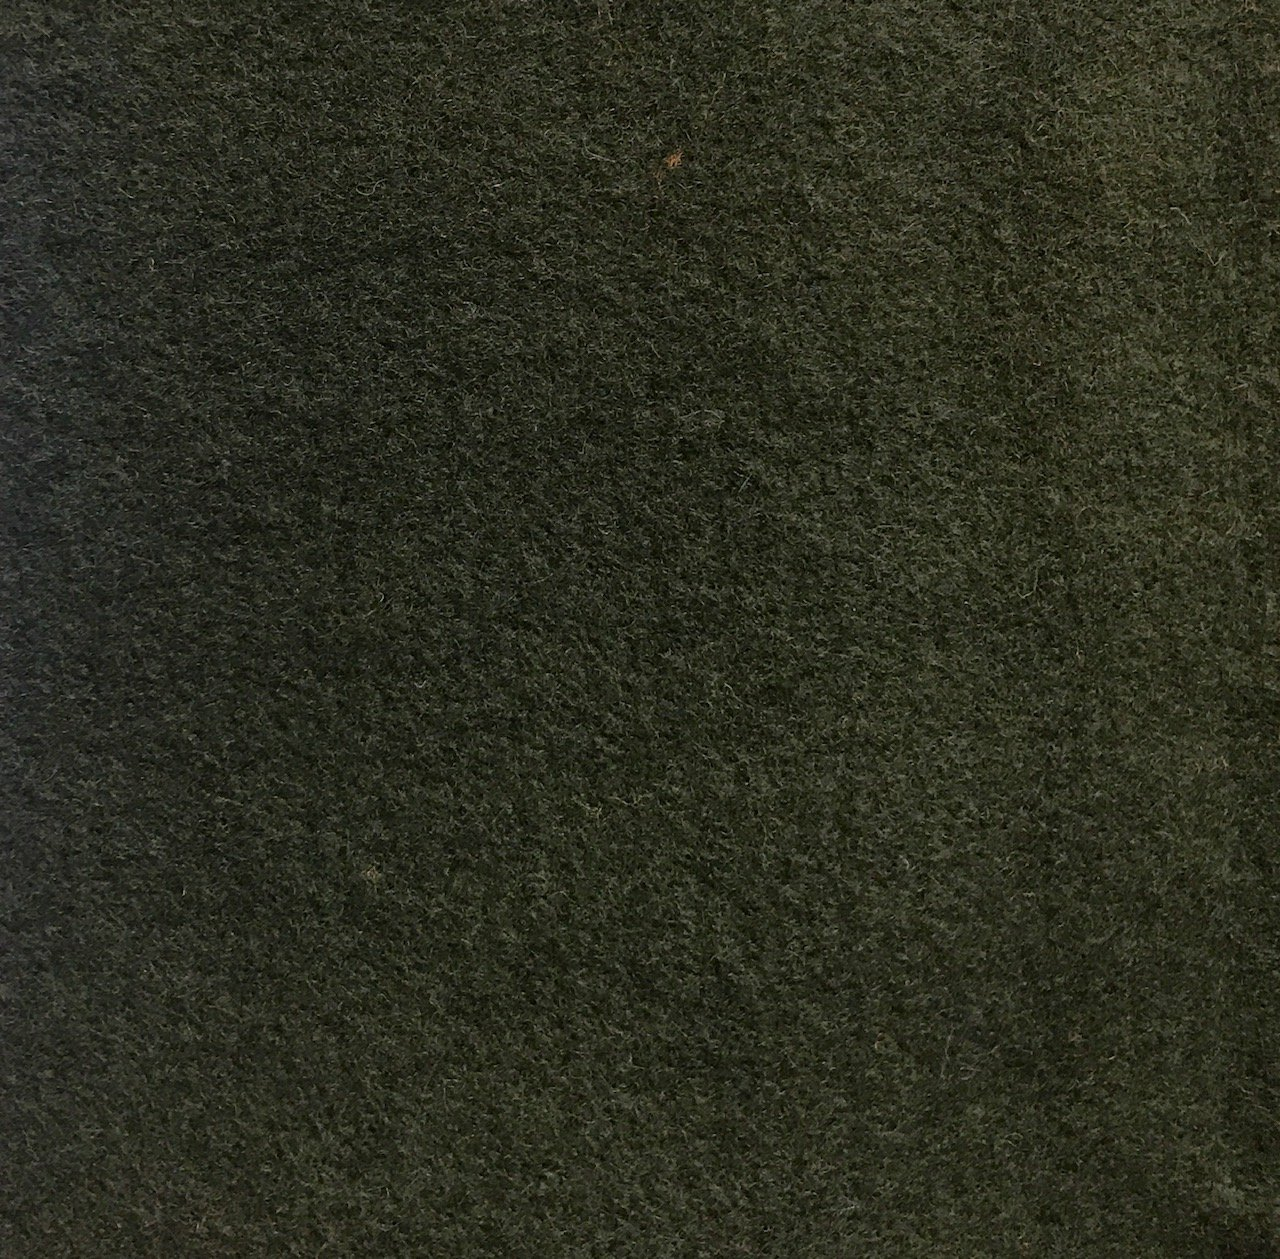 Wool Blend - Grey Olive